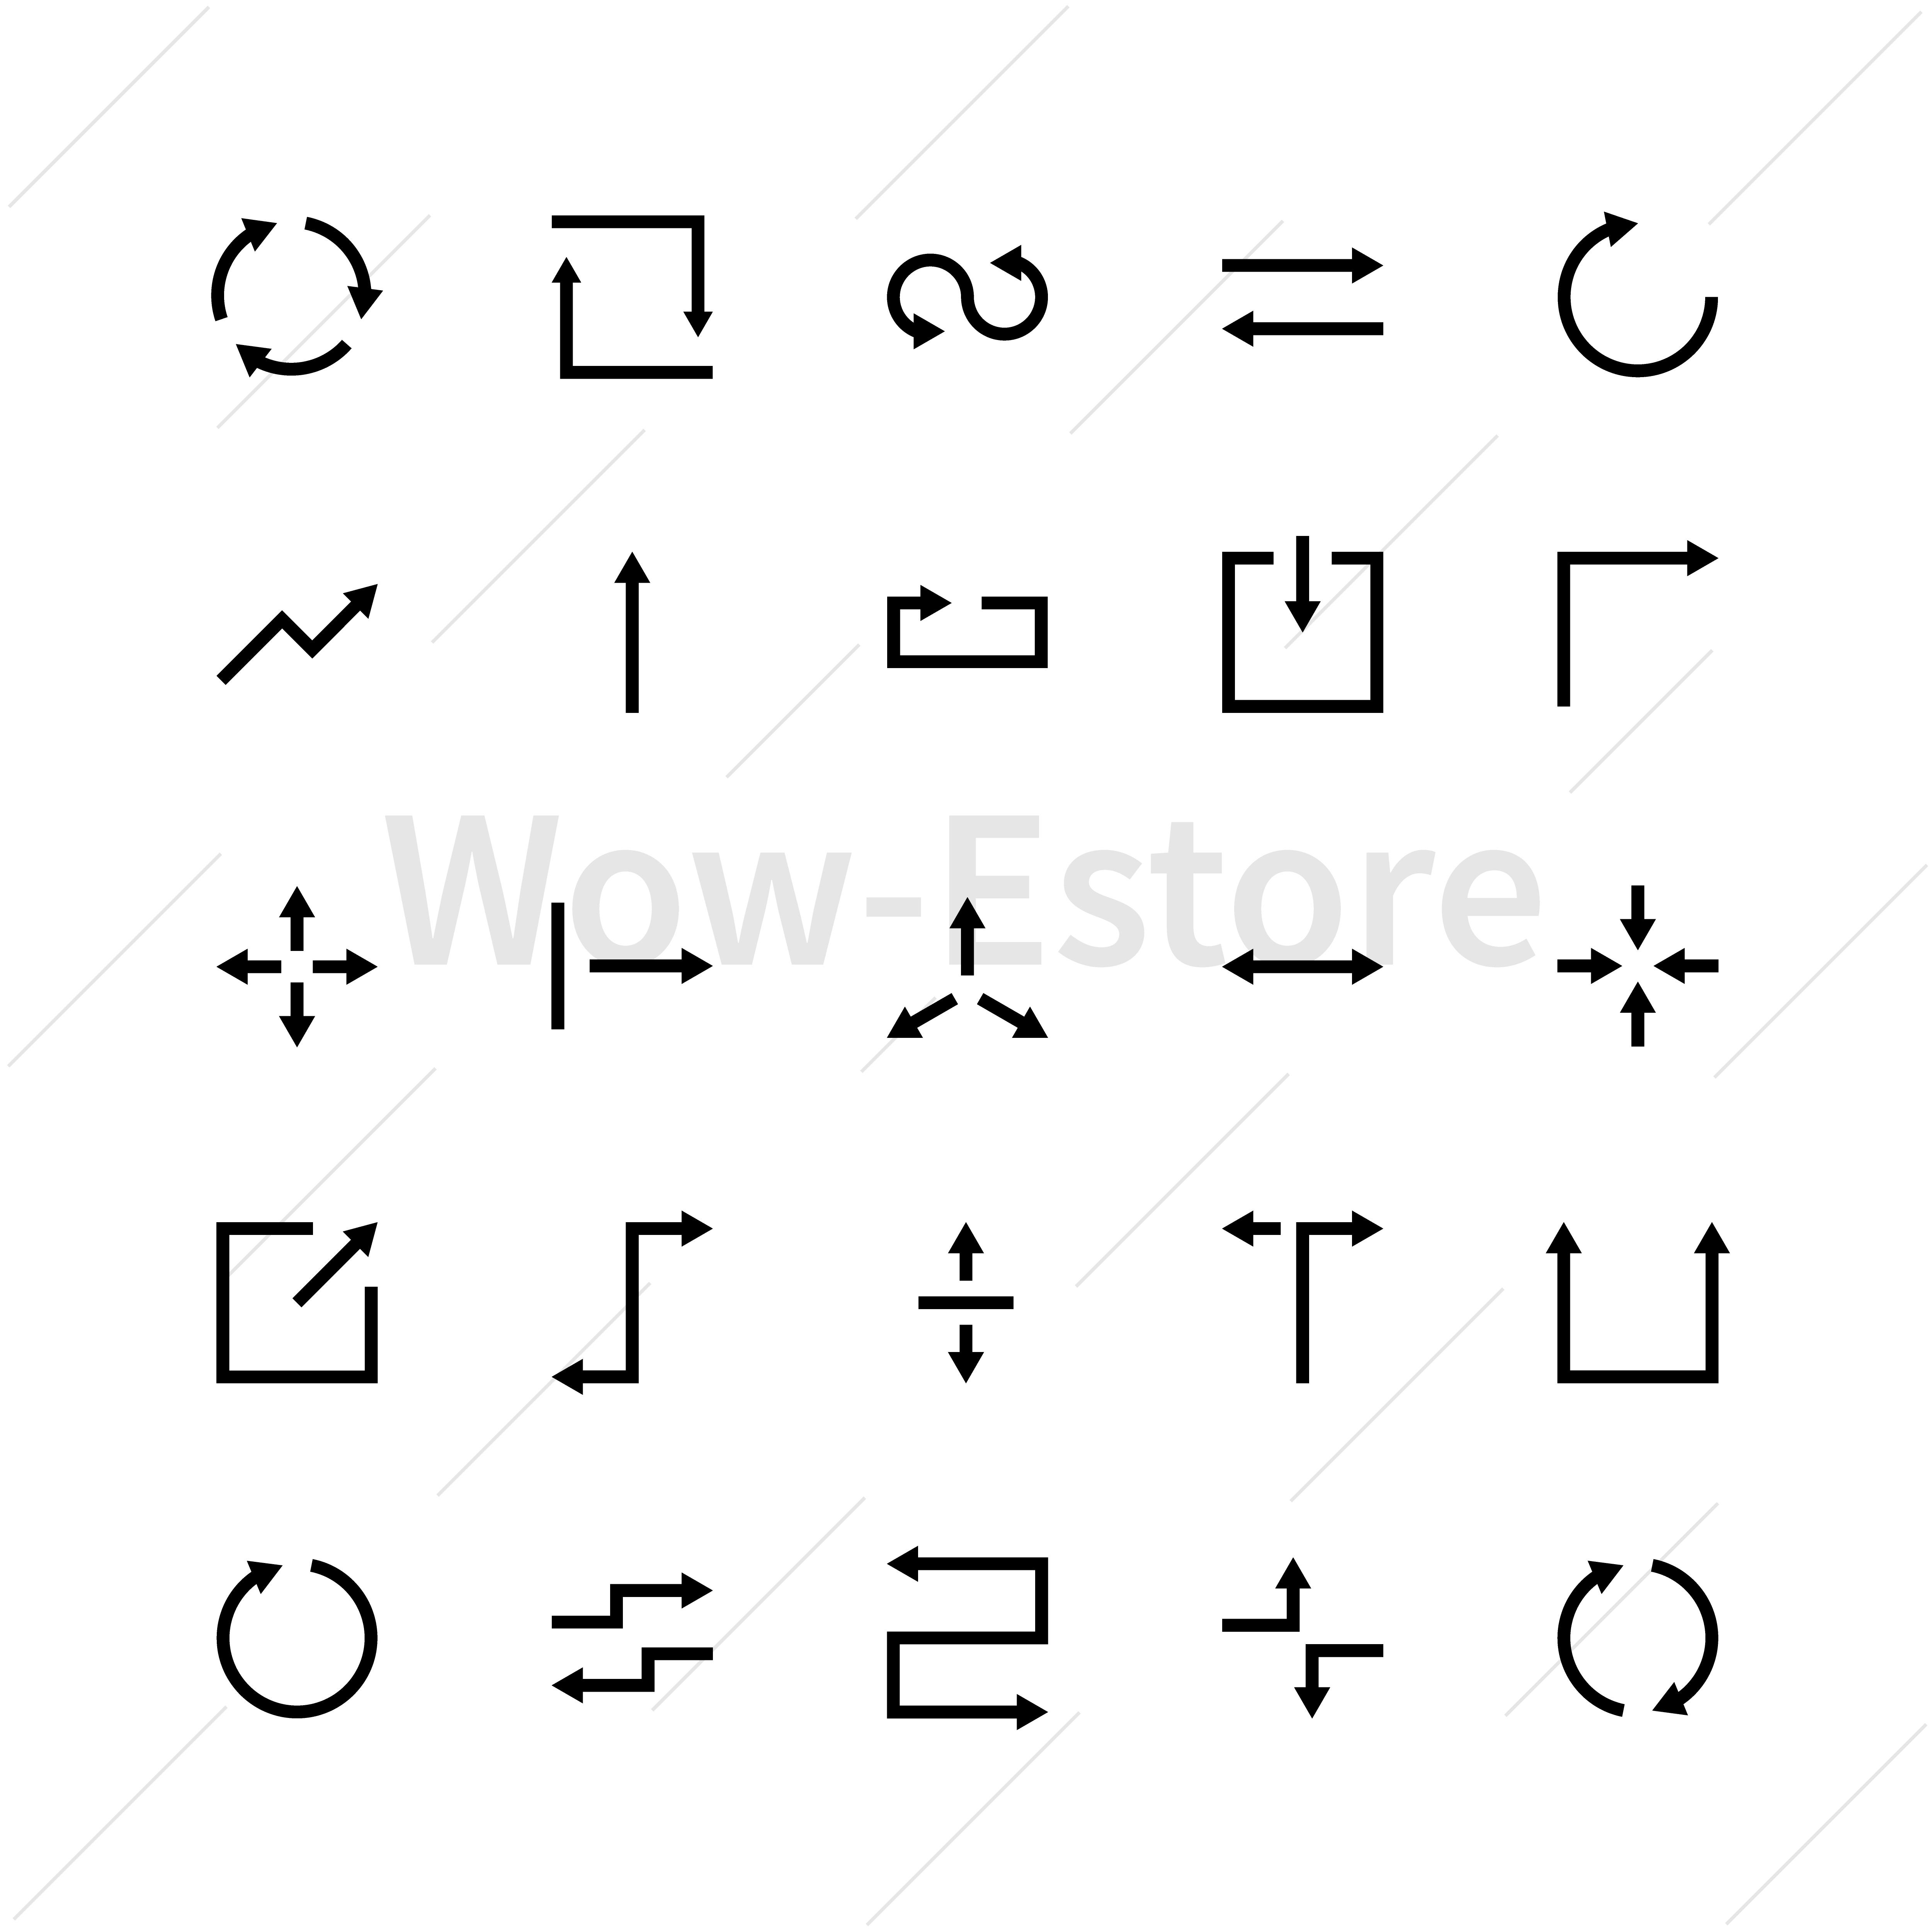 Arrow silhouette icons